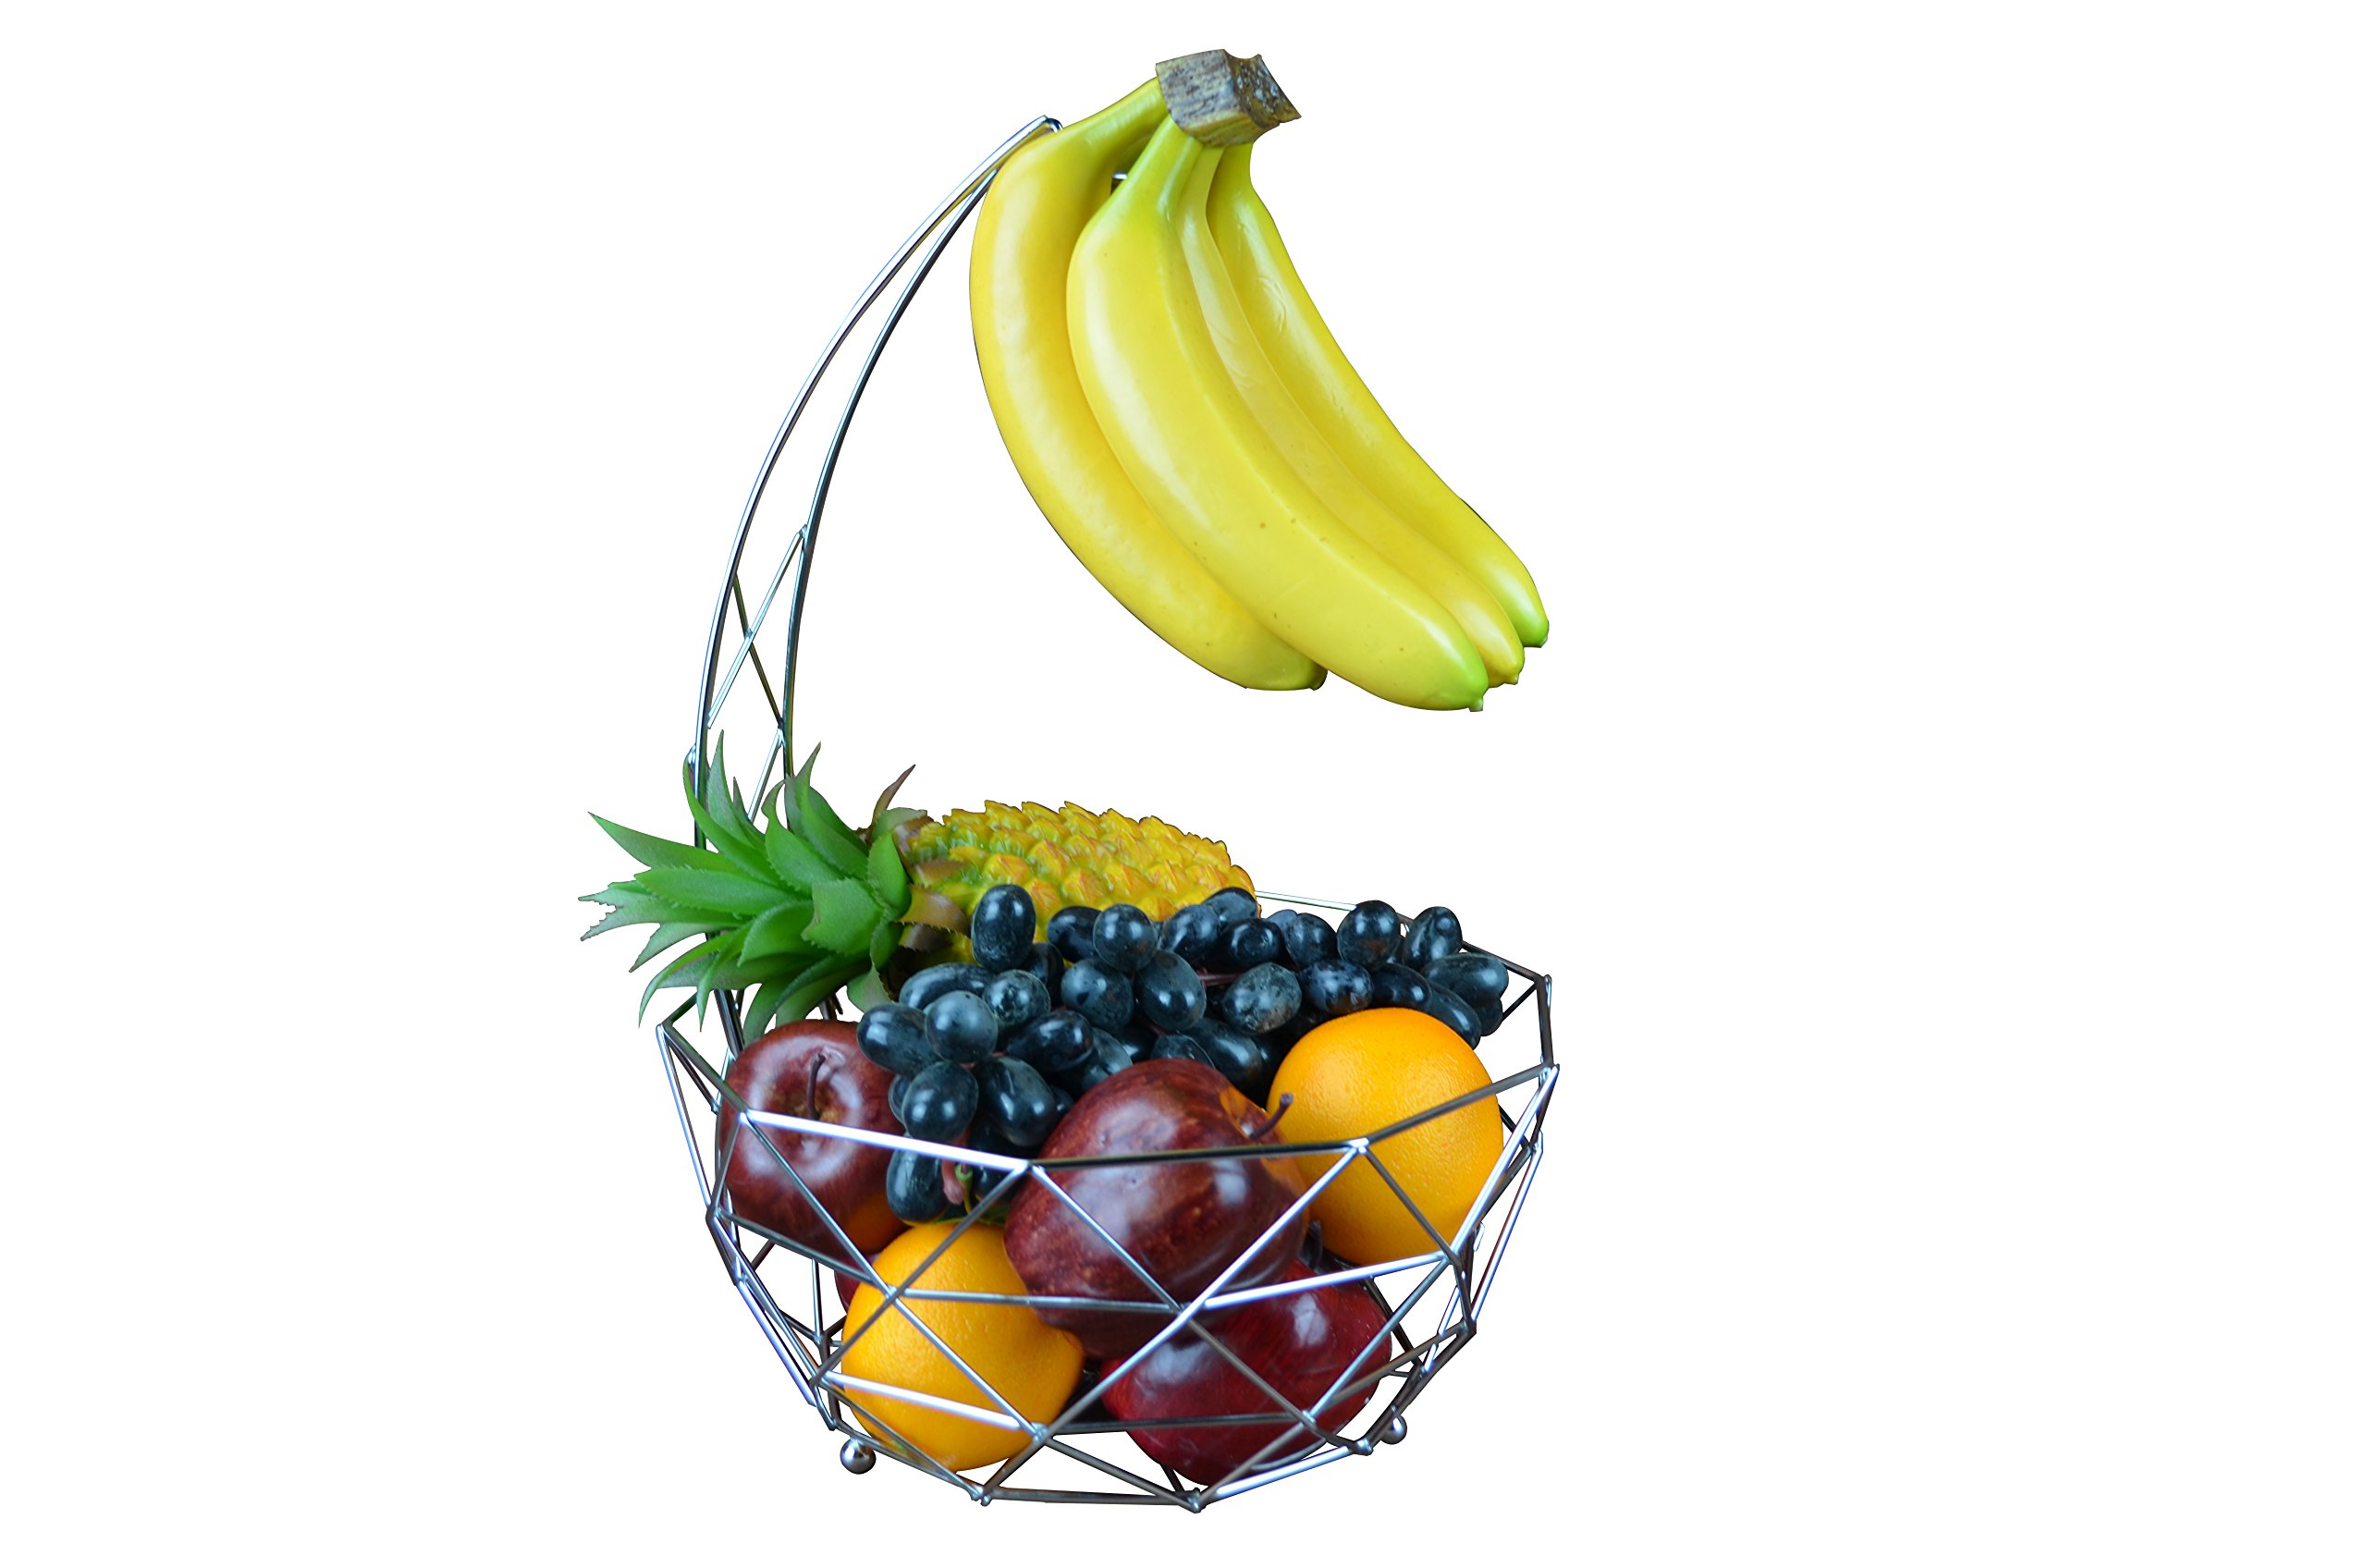 Fruit Basket with Banana Hanger, Detachable Banana Hanger, Home accent furnishings (Chrome)